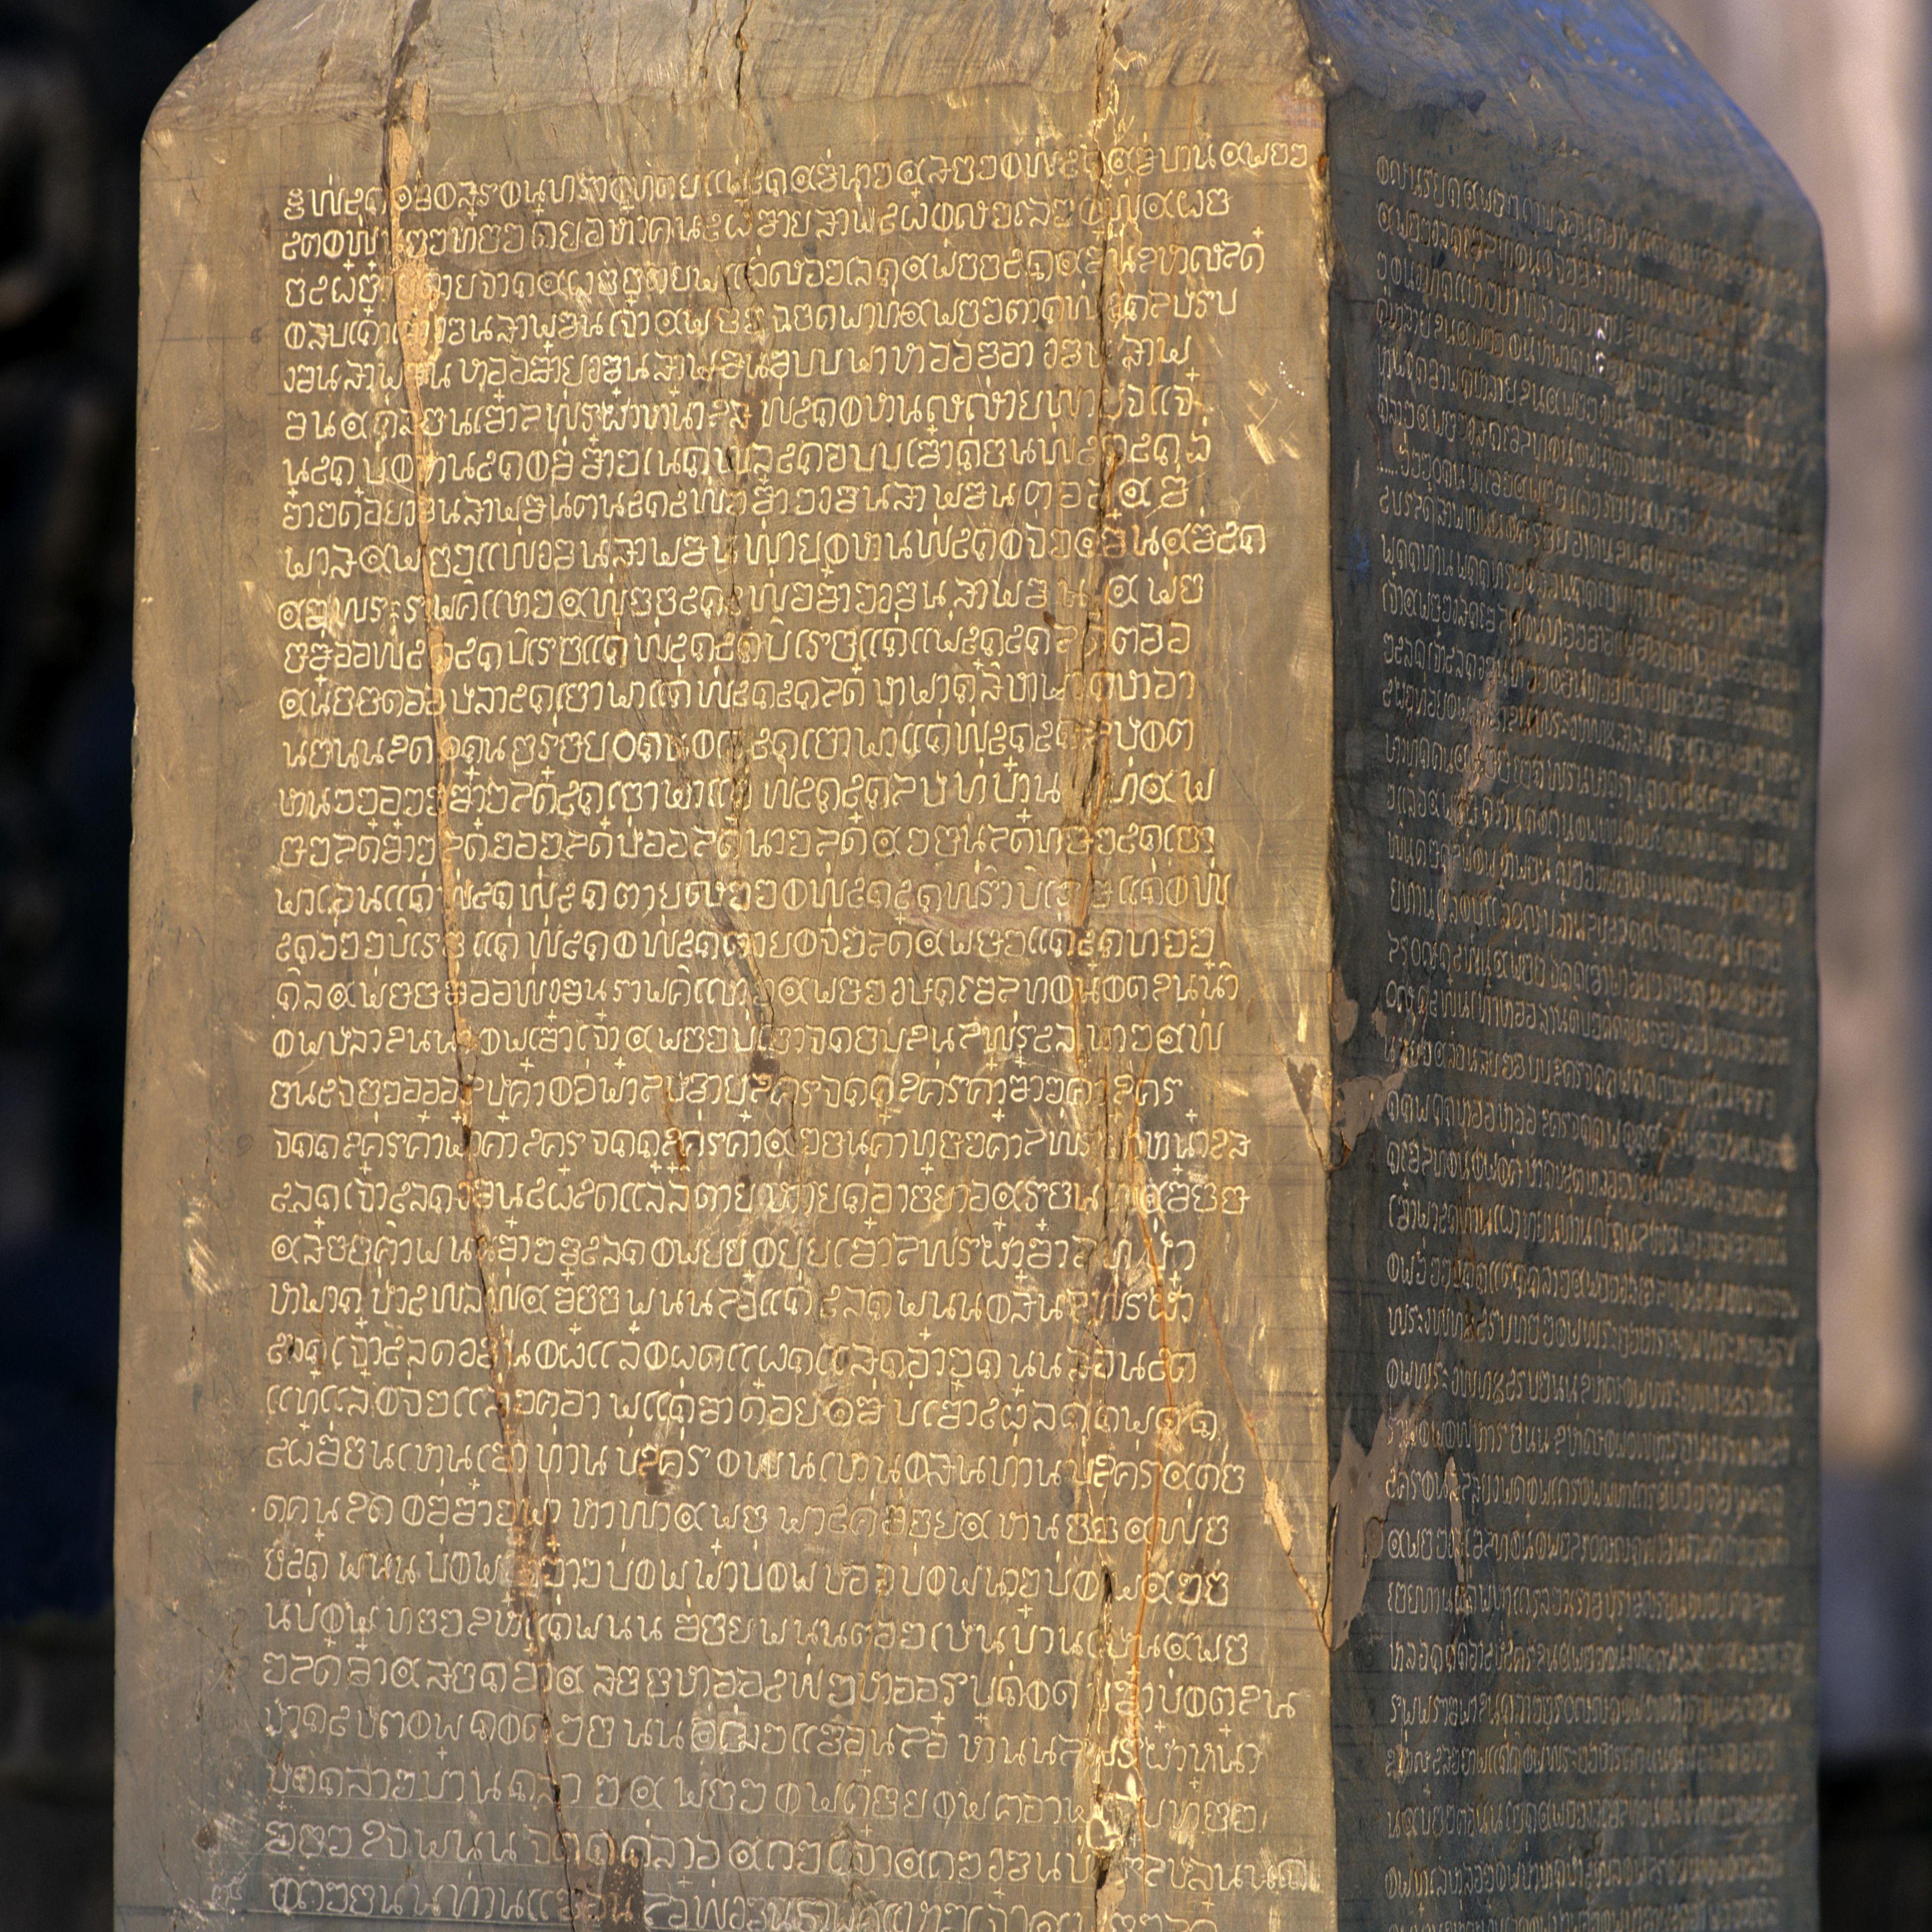 Ramkamhaeng Stele, the earliest known instance of Thai writing